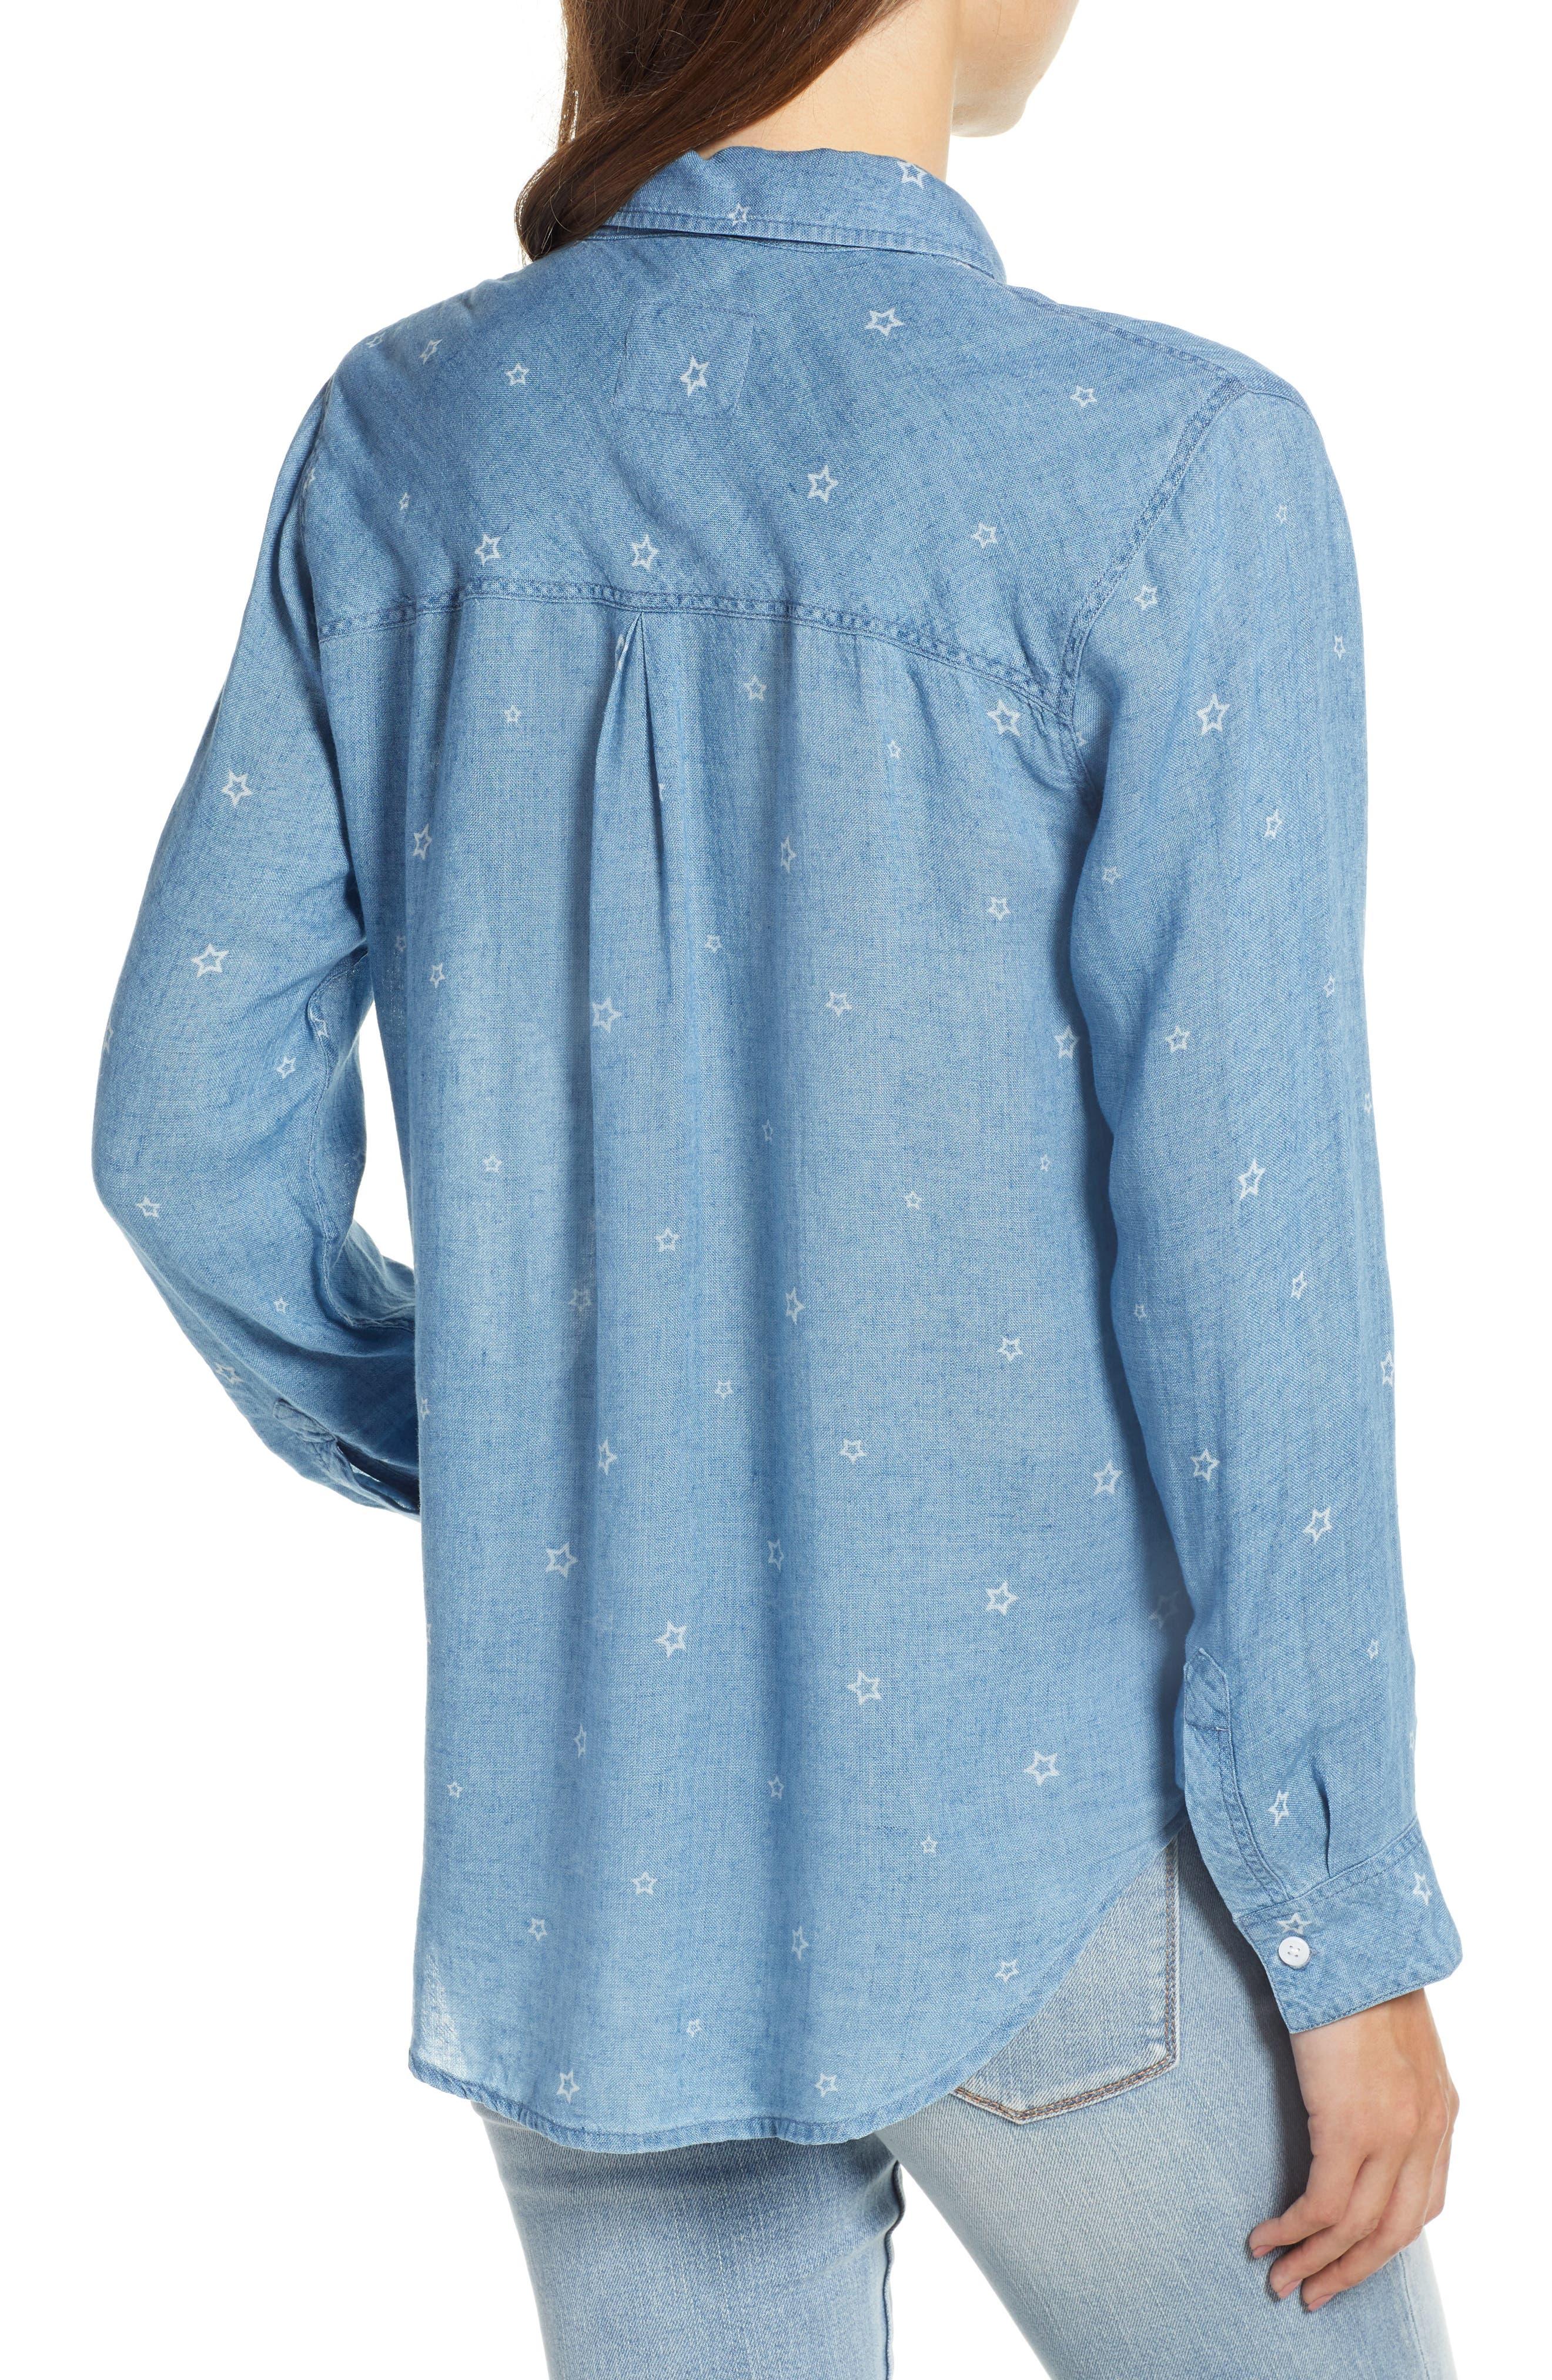 Ingrid Chambray Shirt,                             Alternate thumbnail 3, color,                             INDIGO STARS